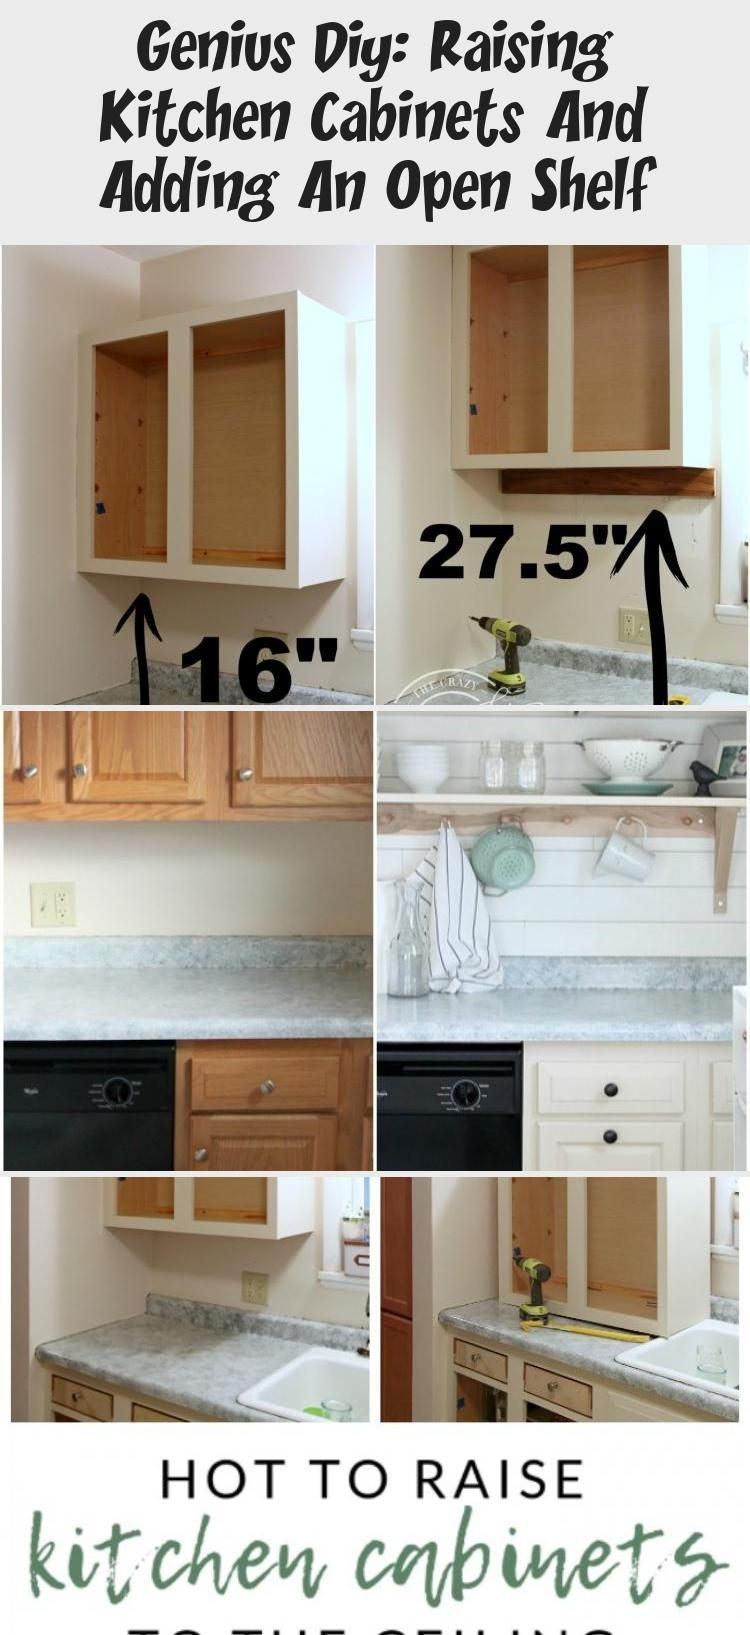 En Blog En Blog In 2020 Kitchen Cabinets Small Kitchen Decor Open Shelving